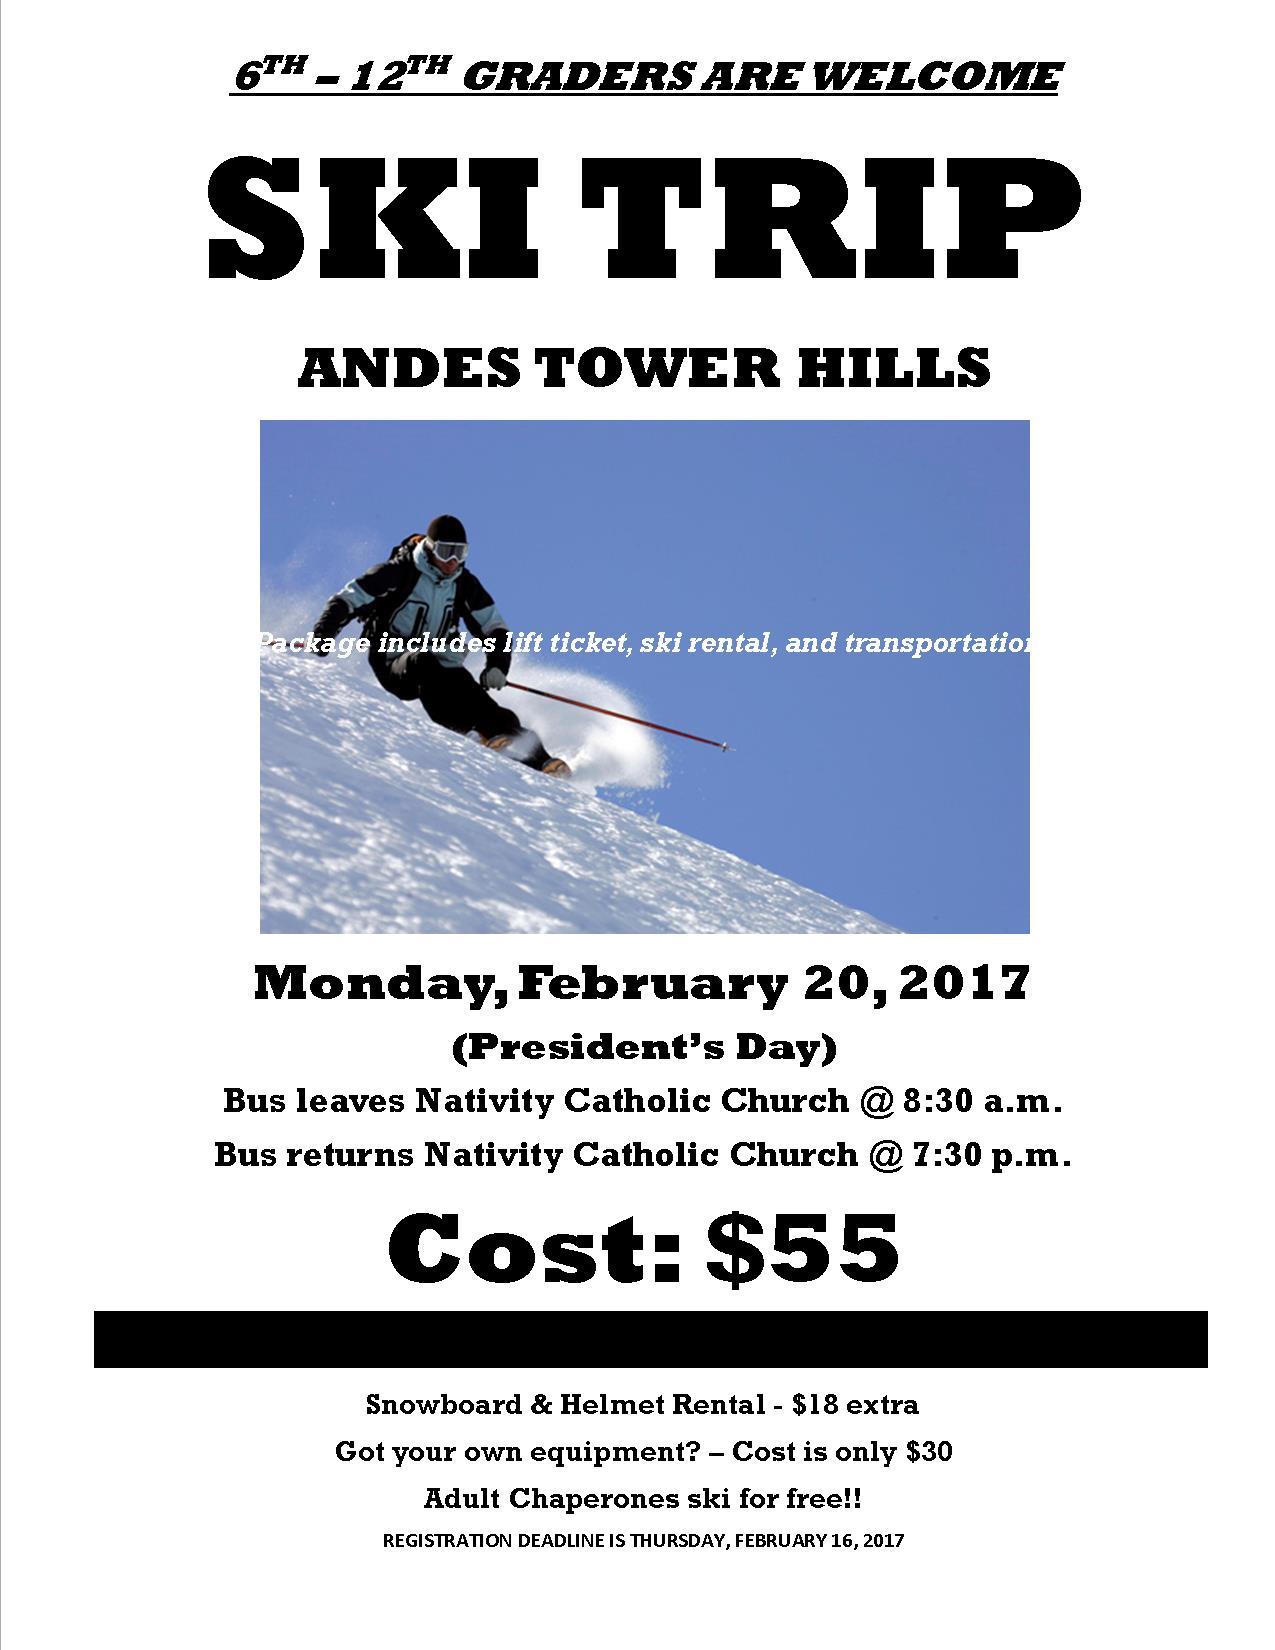 Ski trip website